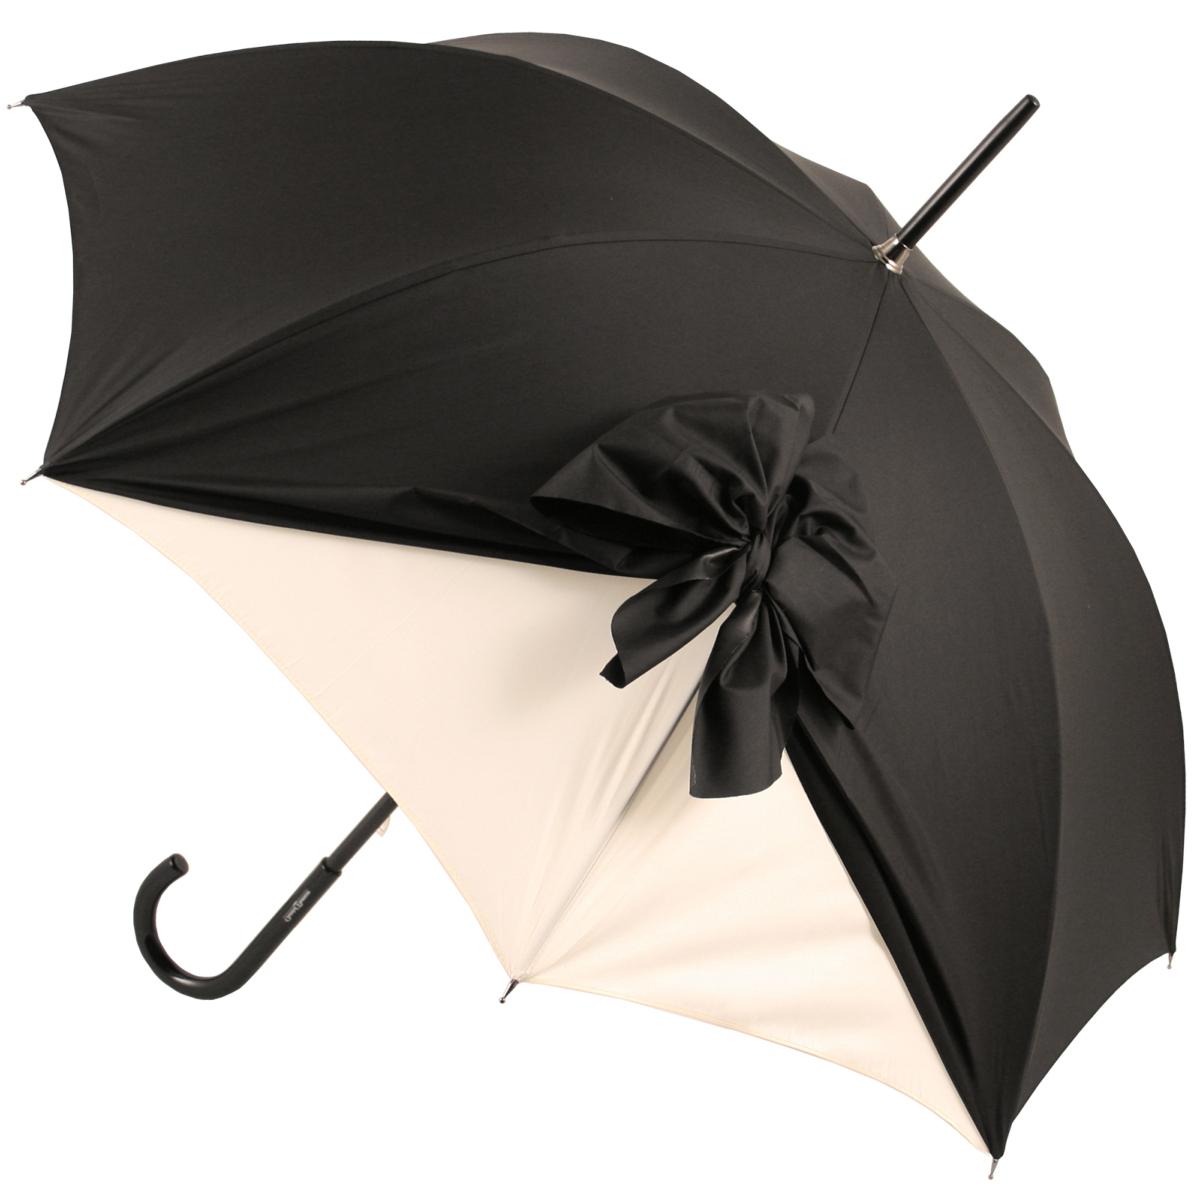 Drape Umbrellas Within Most Recent Drape Umbrella In Black And Creamchantal Thomass (View 15 of 20)